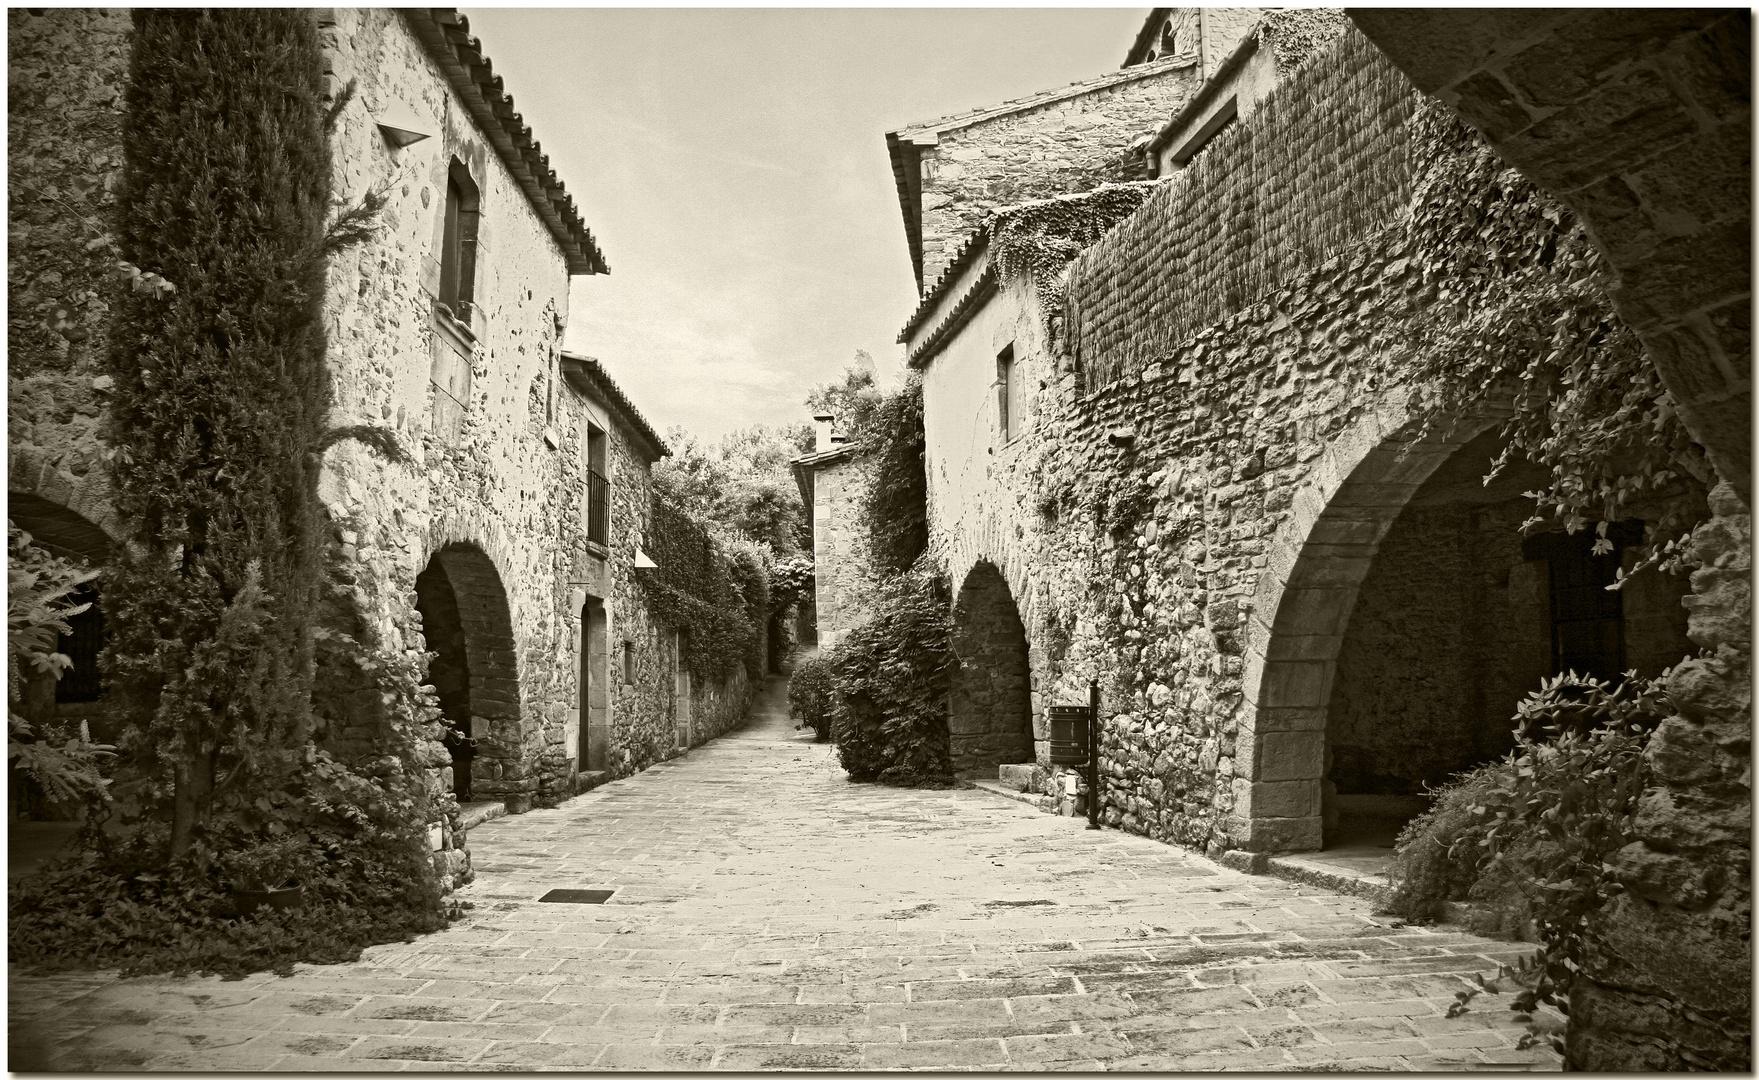 Un carrer medieval